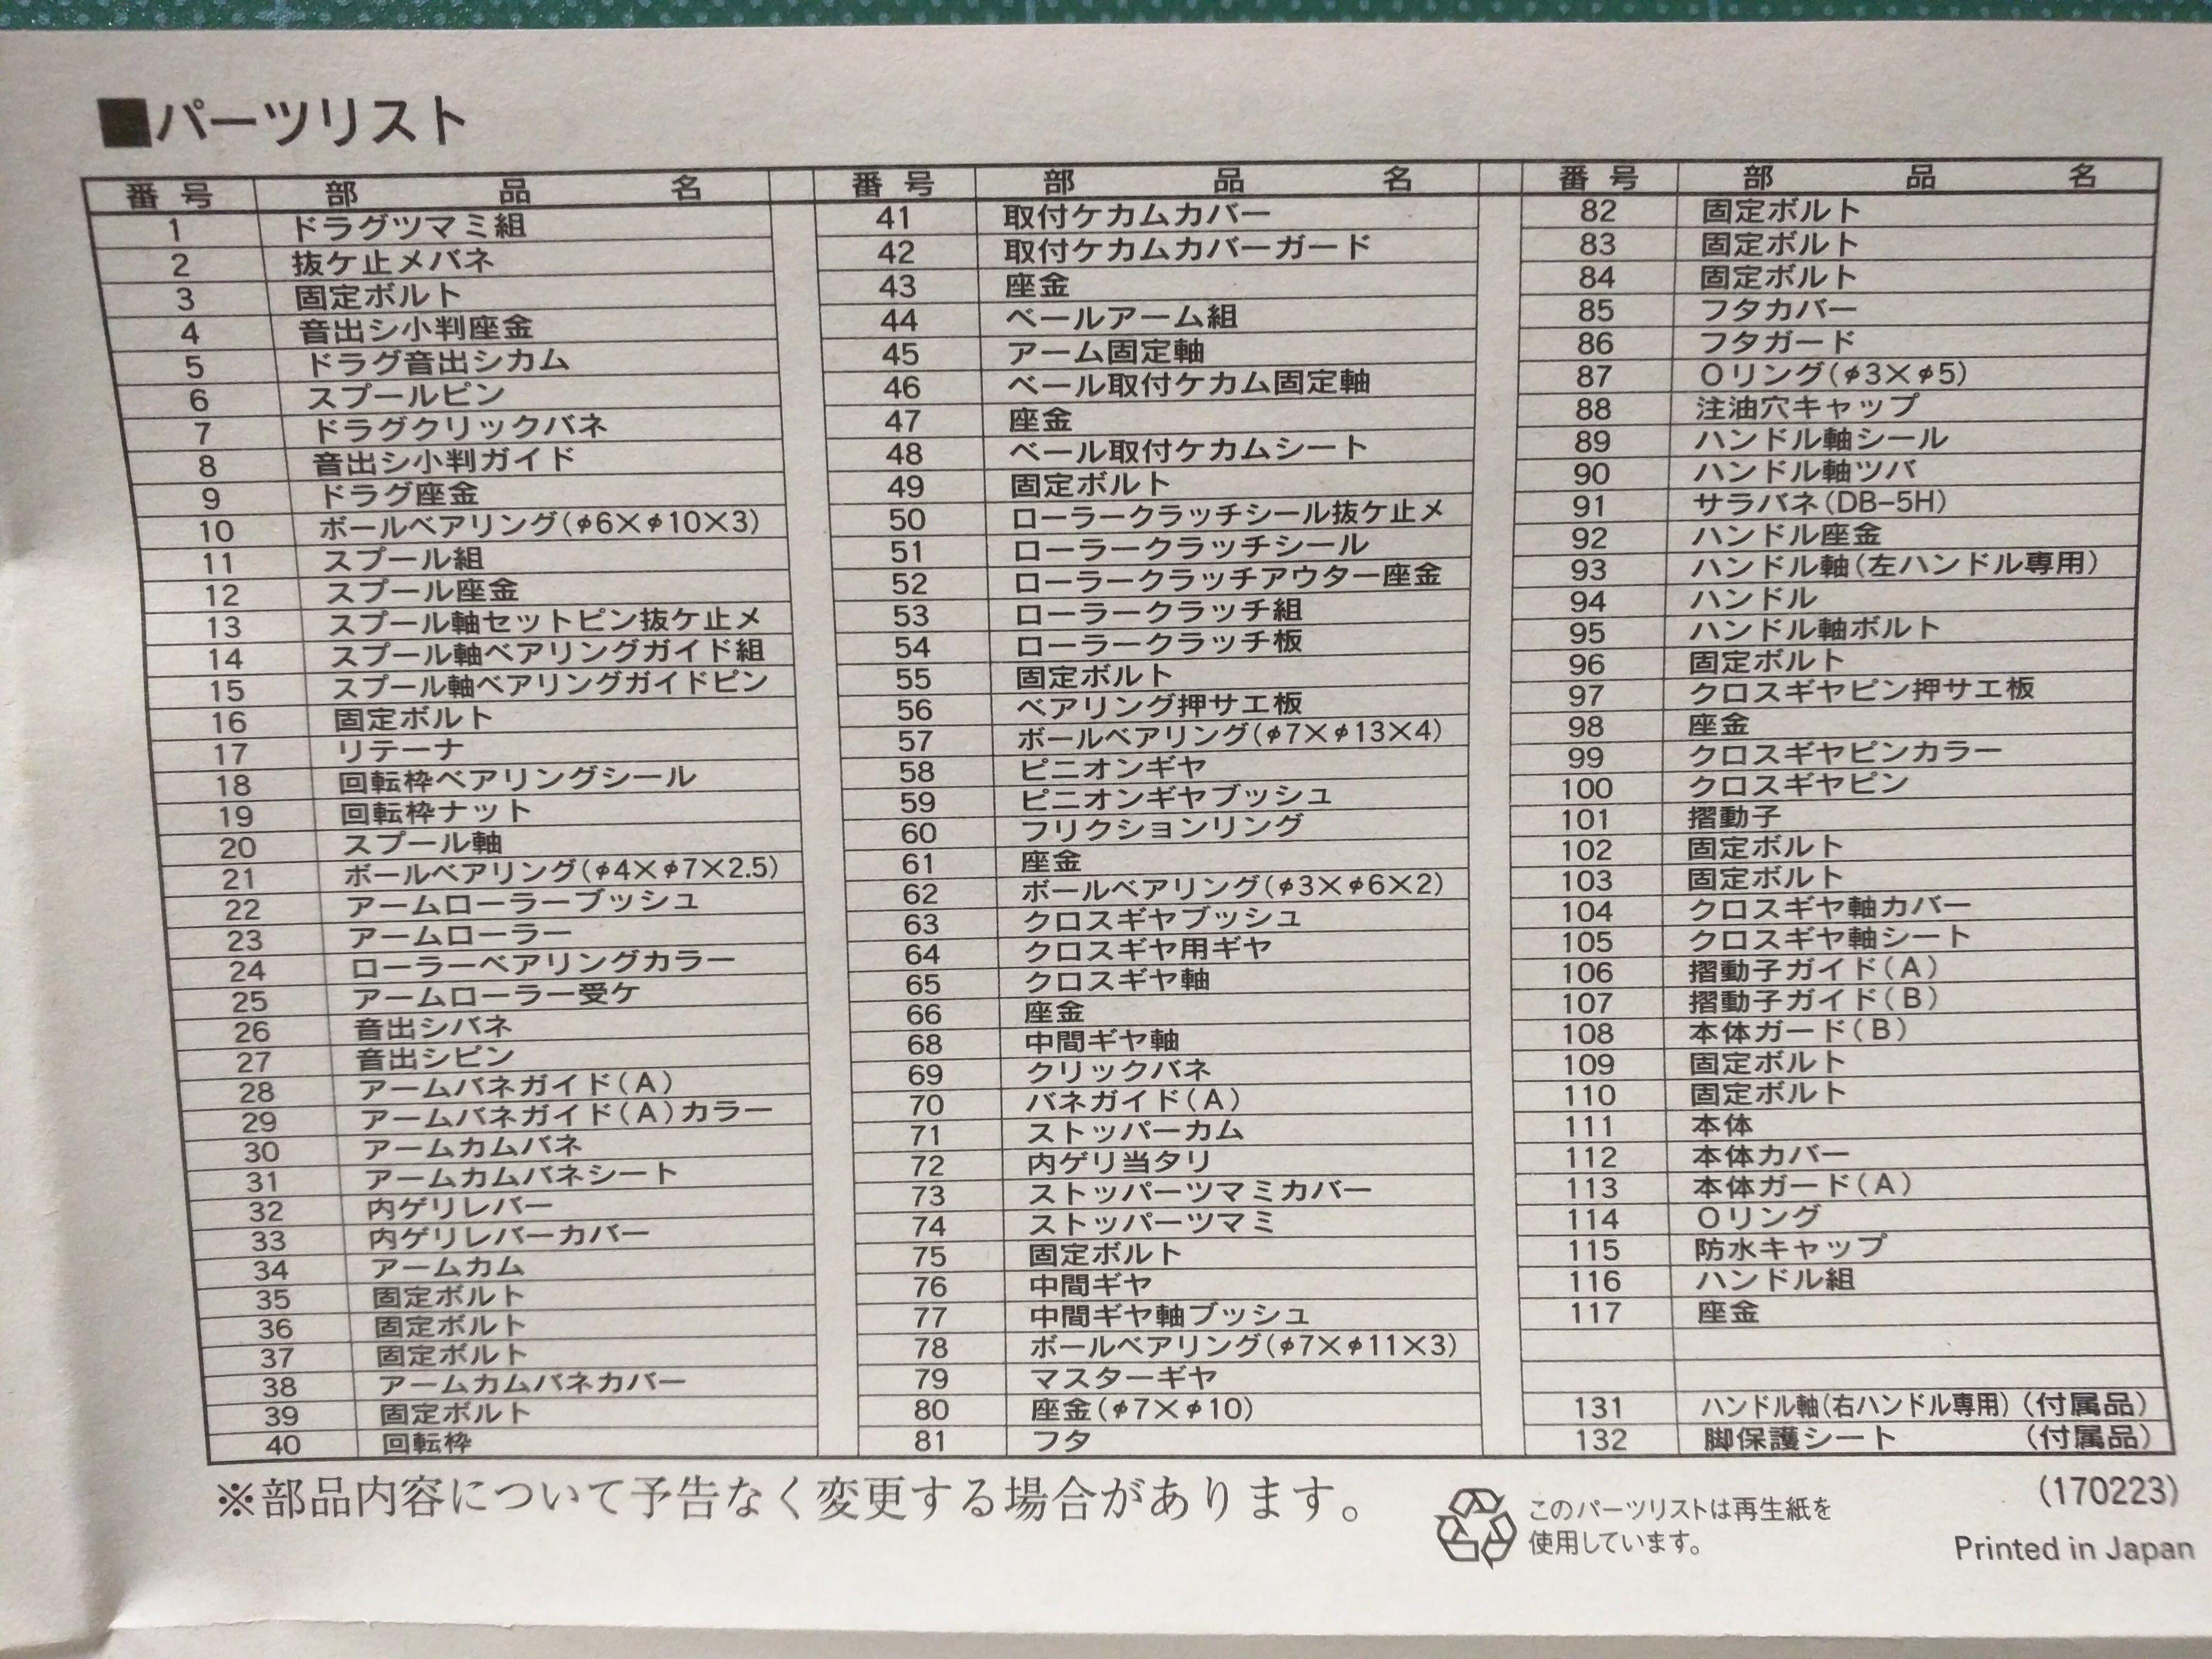 shimano-04stella-1000-parts-list (107223)